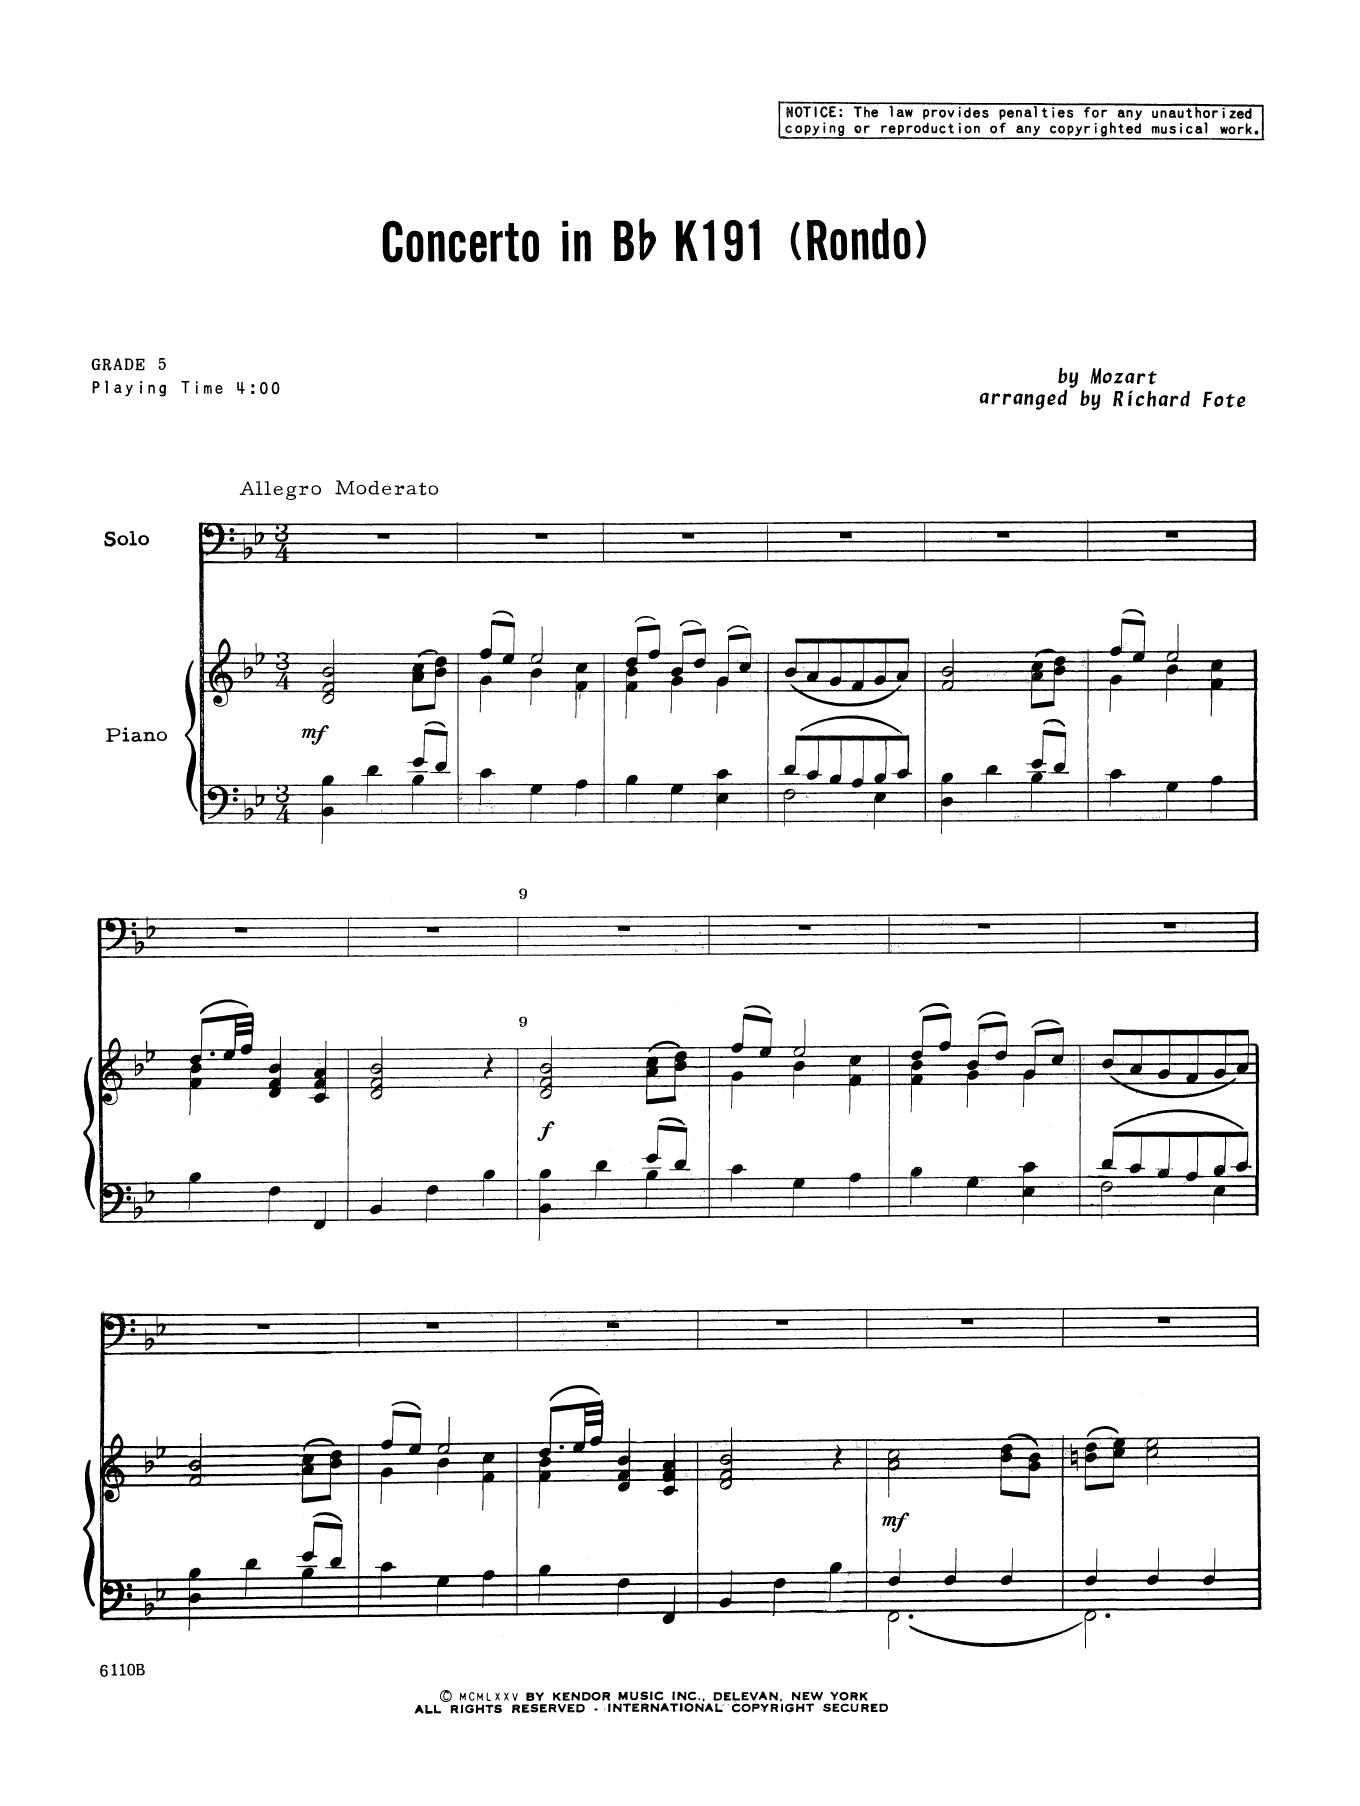 Concerto In Bb K191 (Rondo) - Piano Accompaniment by Richard Fote Brass  Solo Digital Sheet Music